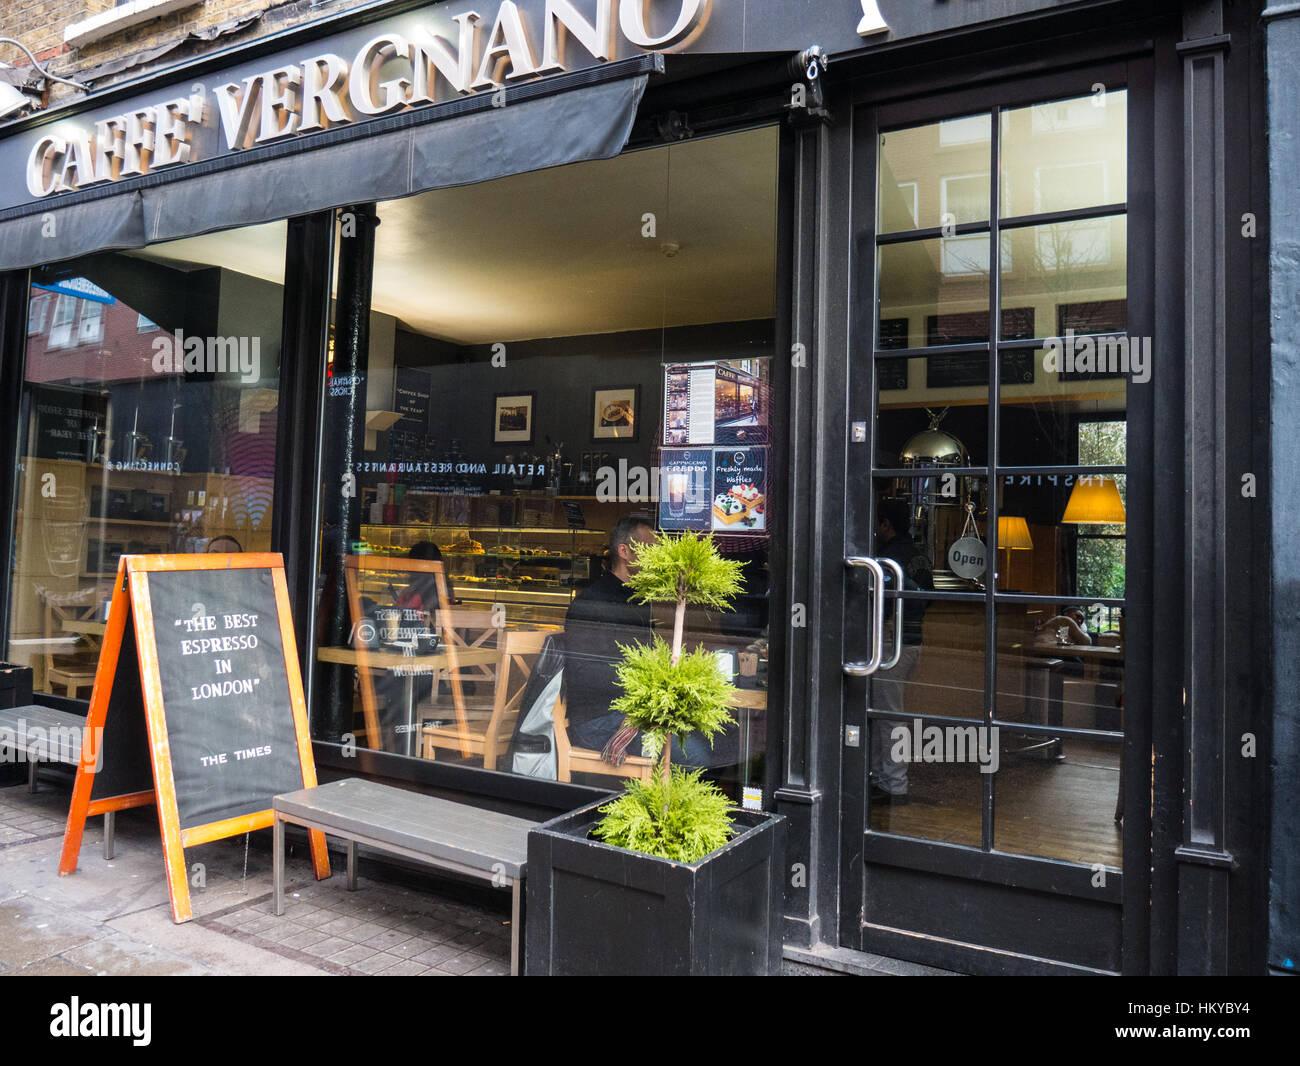 Cafee Vergnano 1882, Charring Cross rd London, England - Stock Image